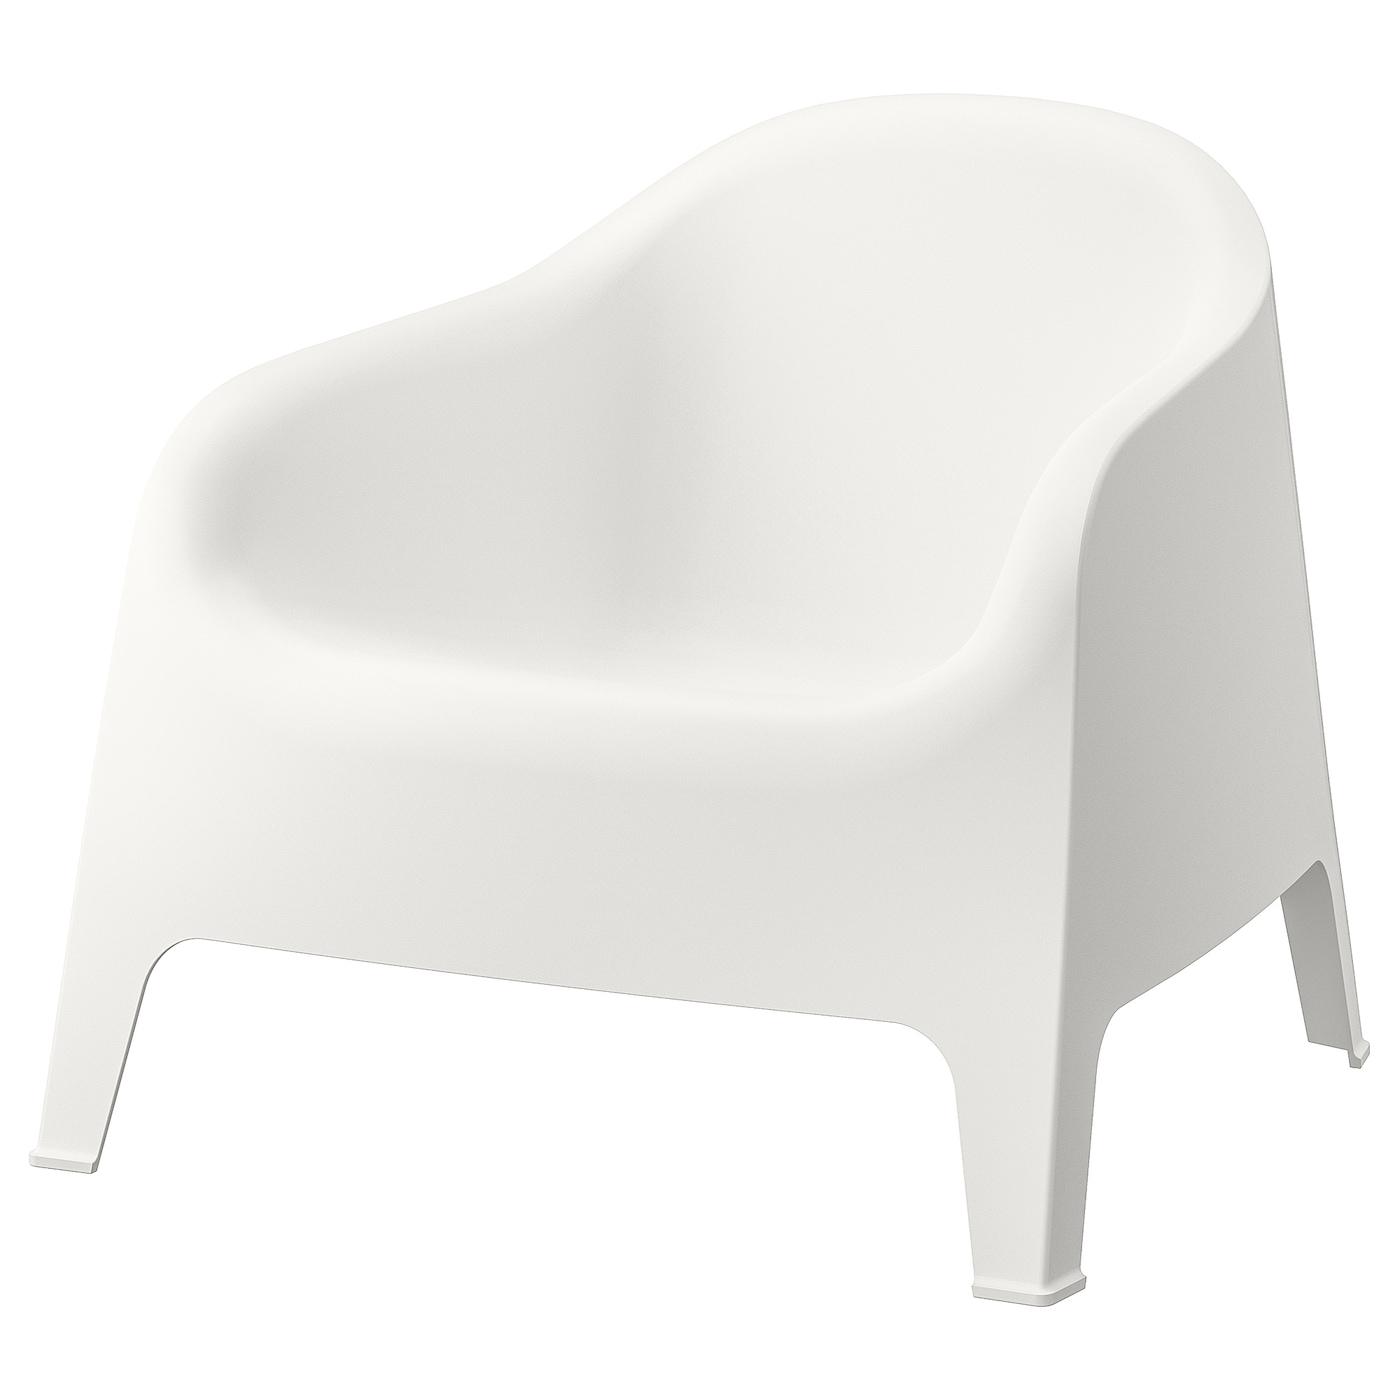 Sedie Giardino Plastica Ikea.Skarpo Poltrona Da Giardino Bianco Ikea